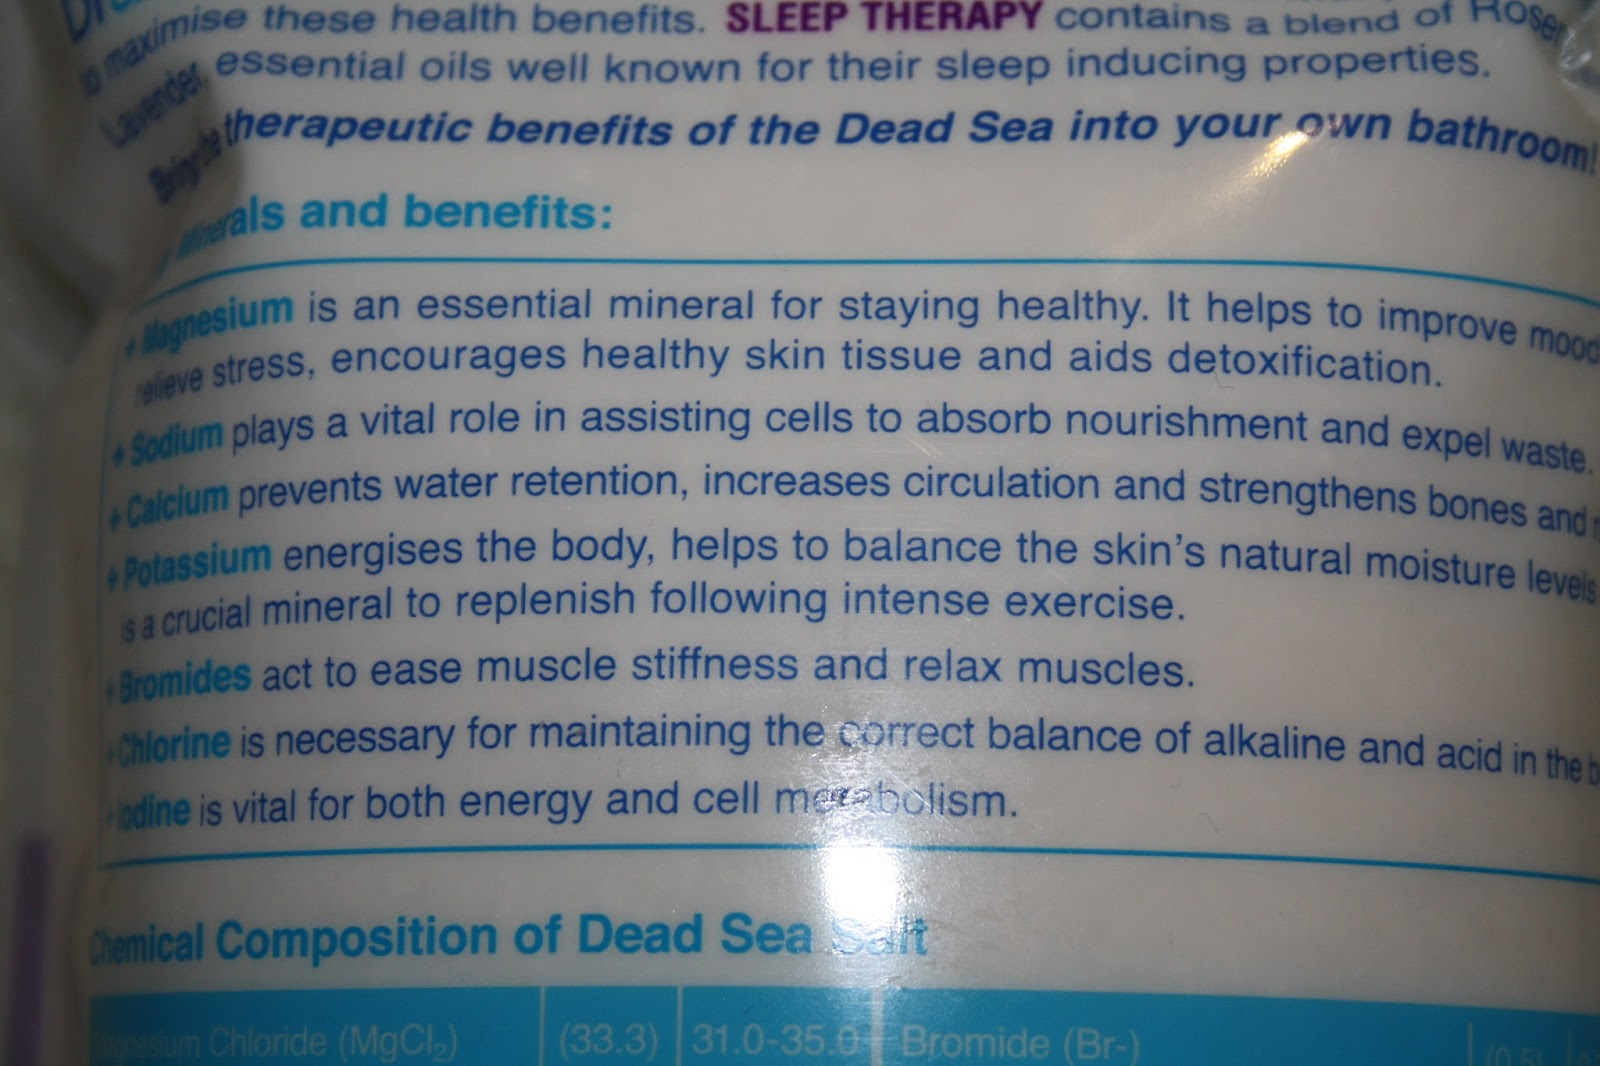 DrSaltsSleepTherapy